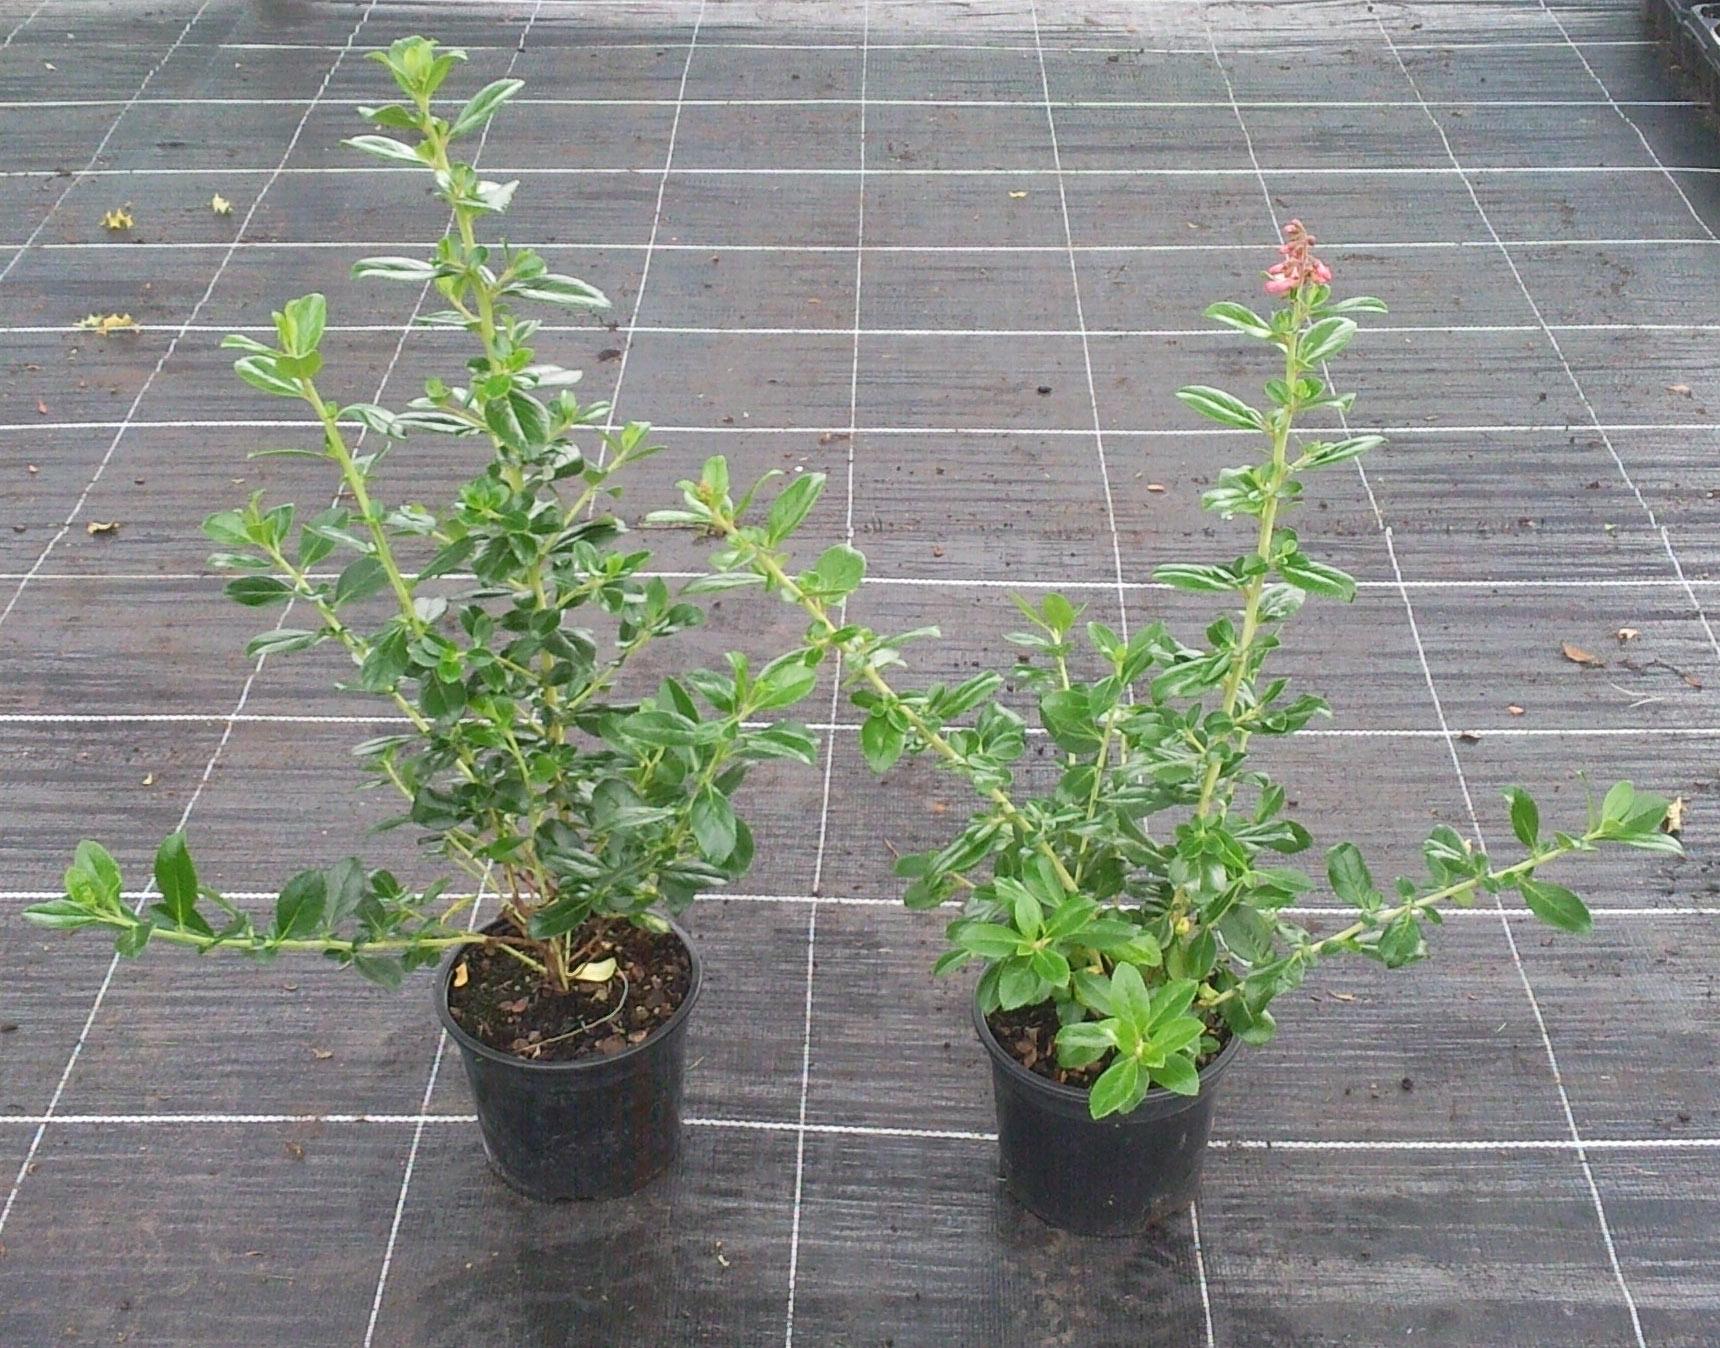 escallonia macrantha hedging plants 2l pot hedging uk. Black Bedroom Furniture Sets. Home Design Ideas